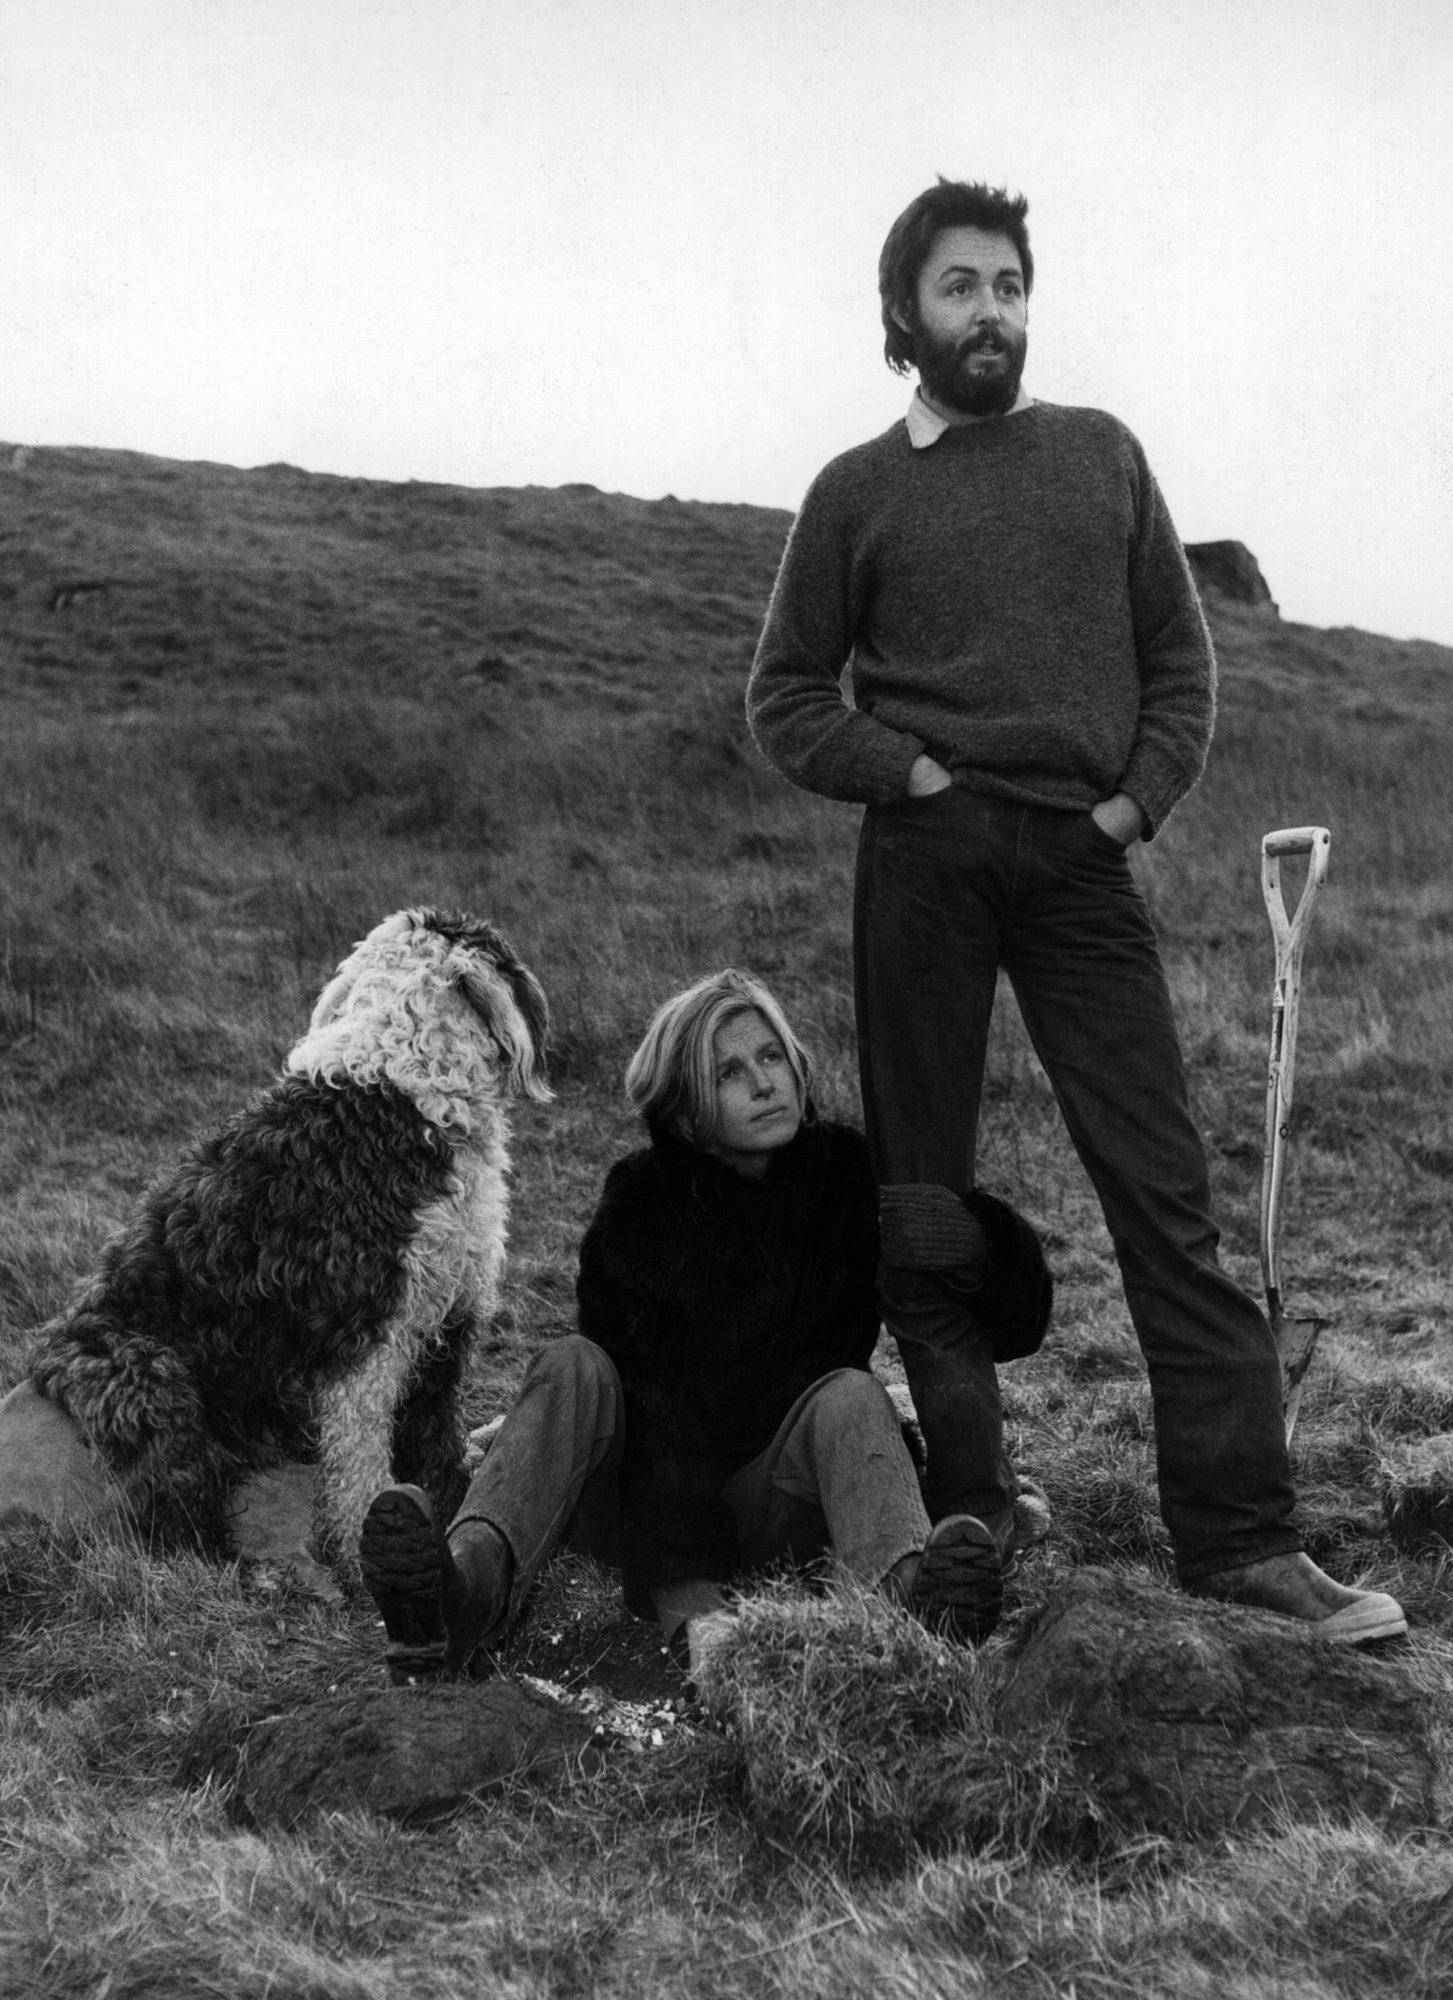 Rural McCartneys